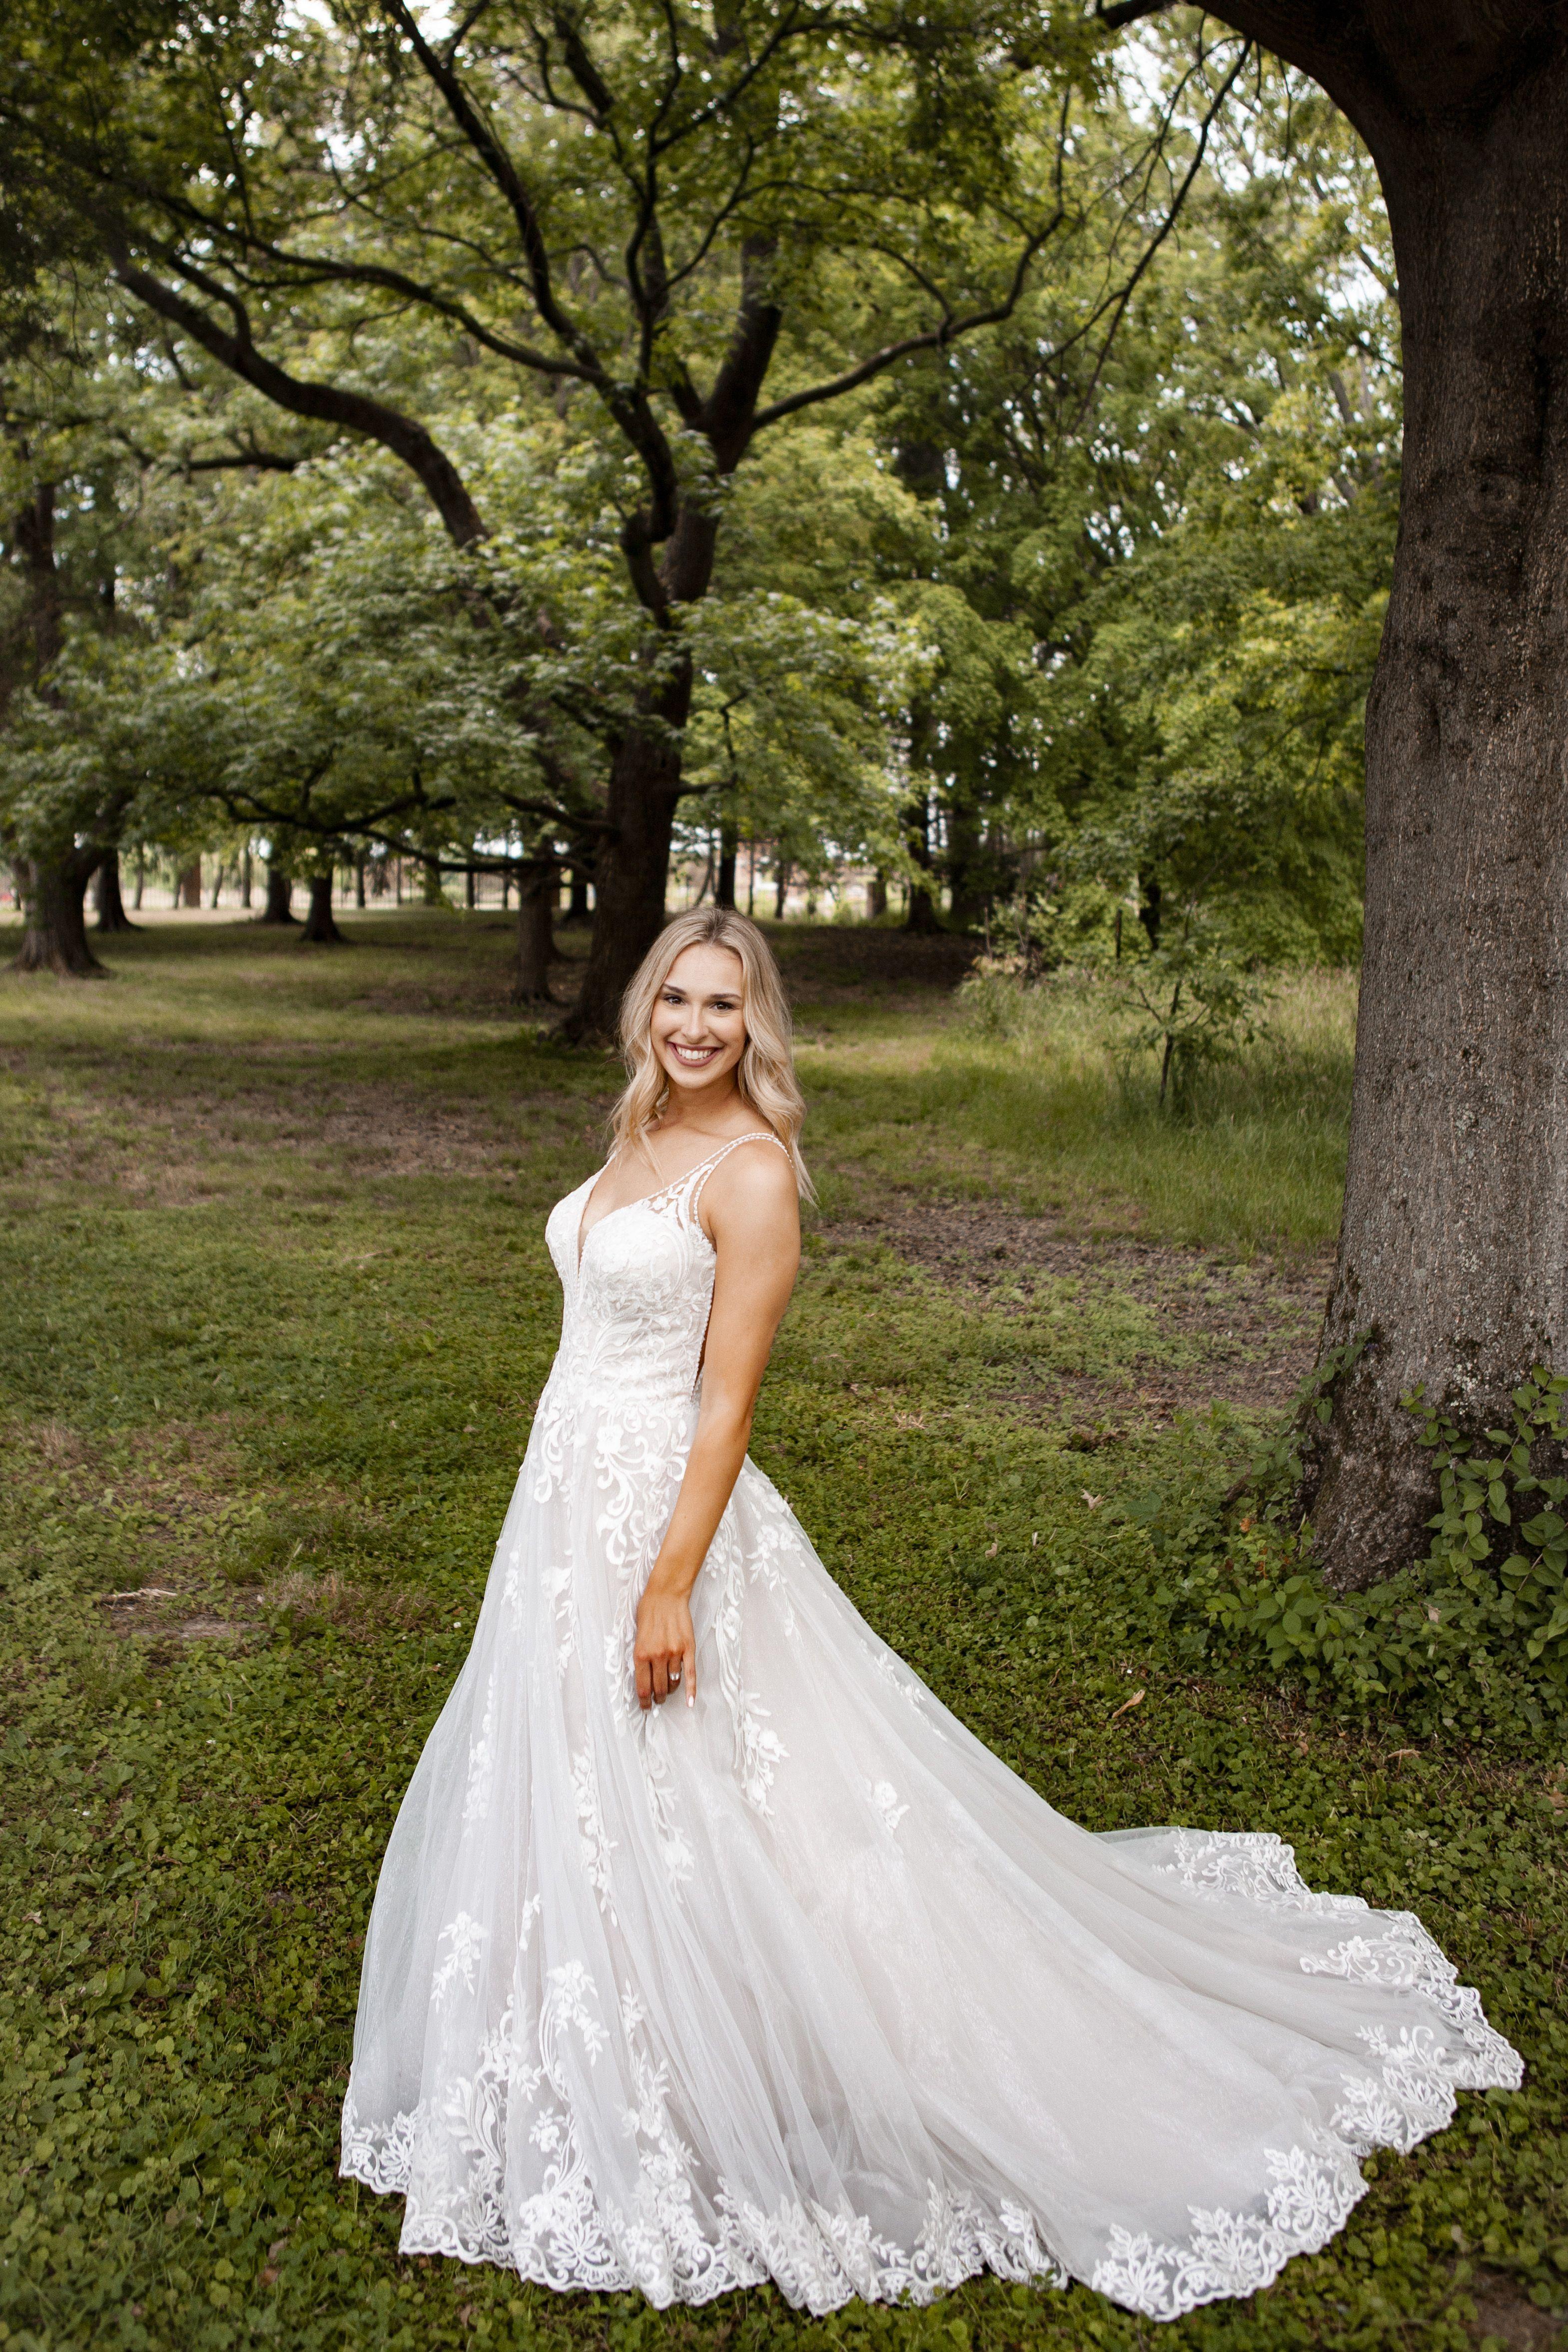 ALine Essence of Australia Wedding Dress with a train in